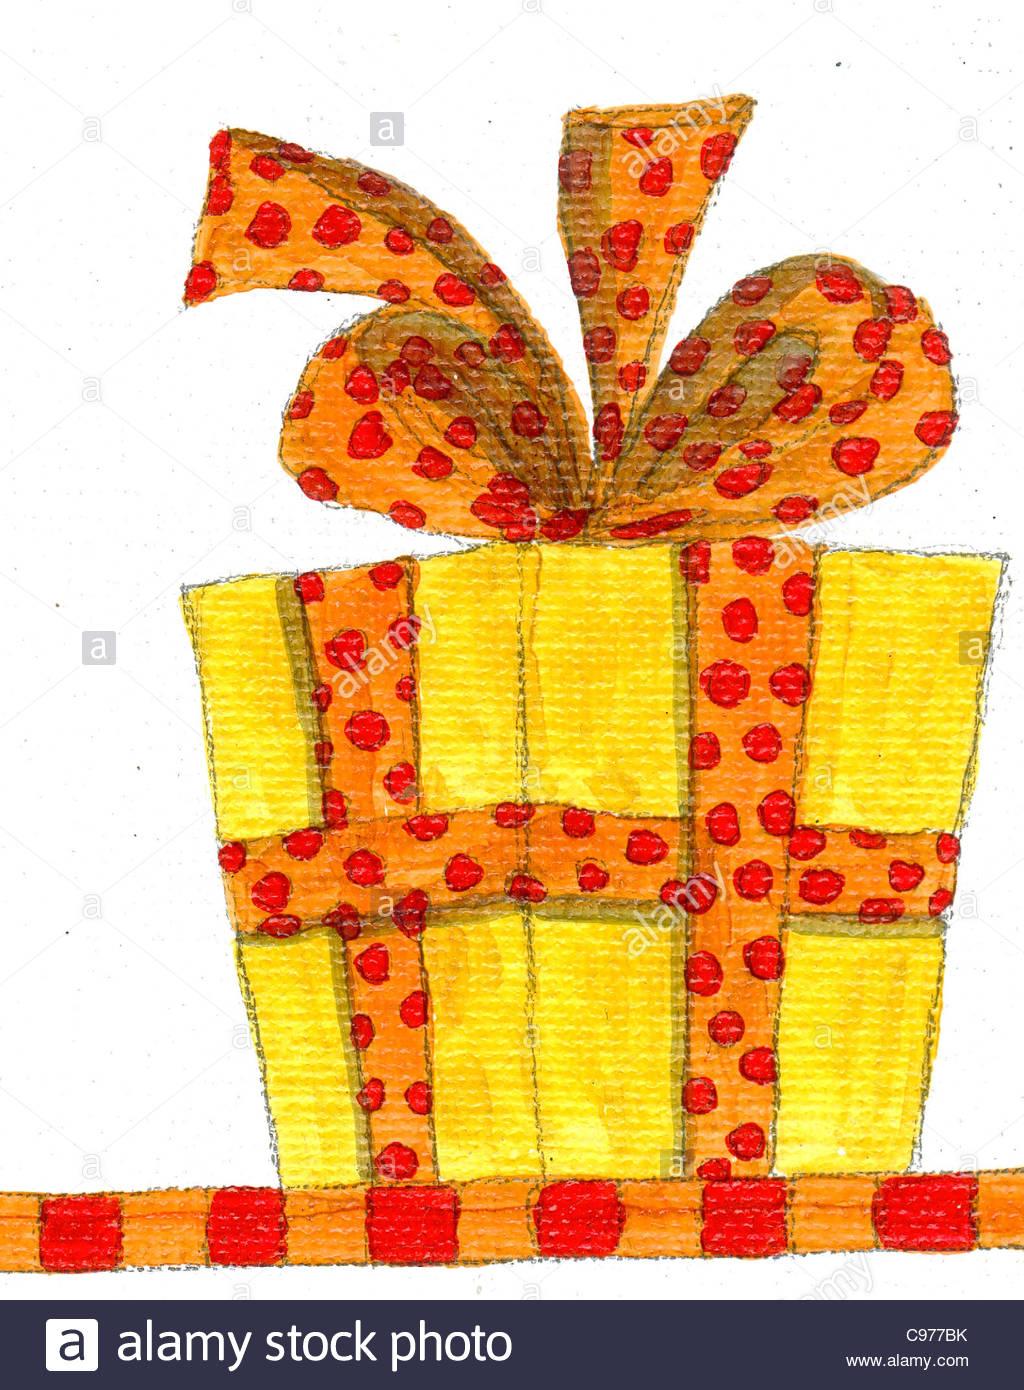 Geschenk Paket Geschenk Box Geschenkverpackung Praesent Praesent